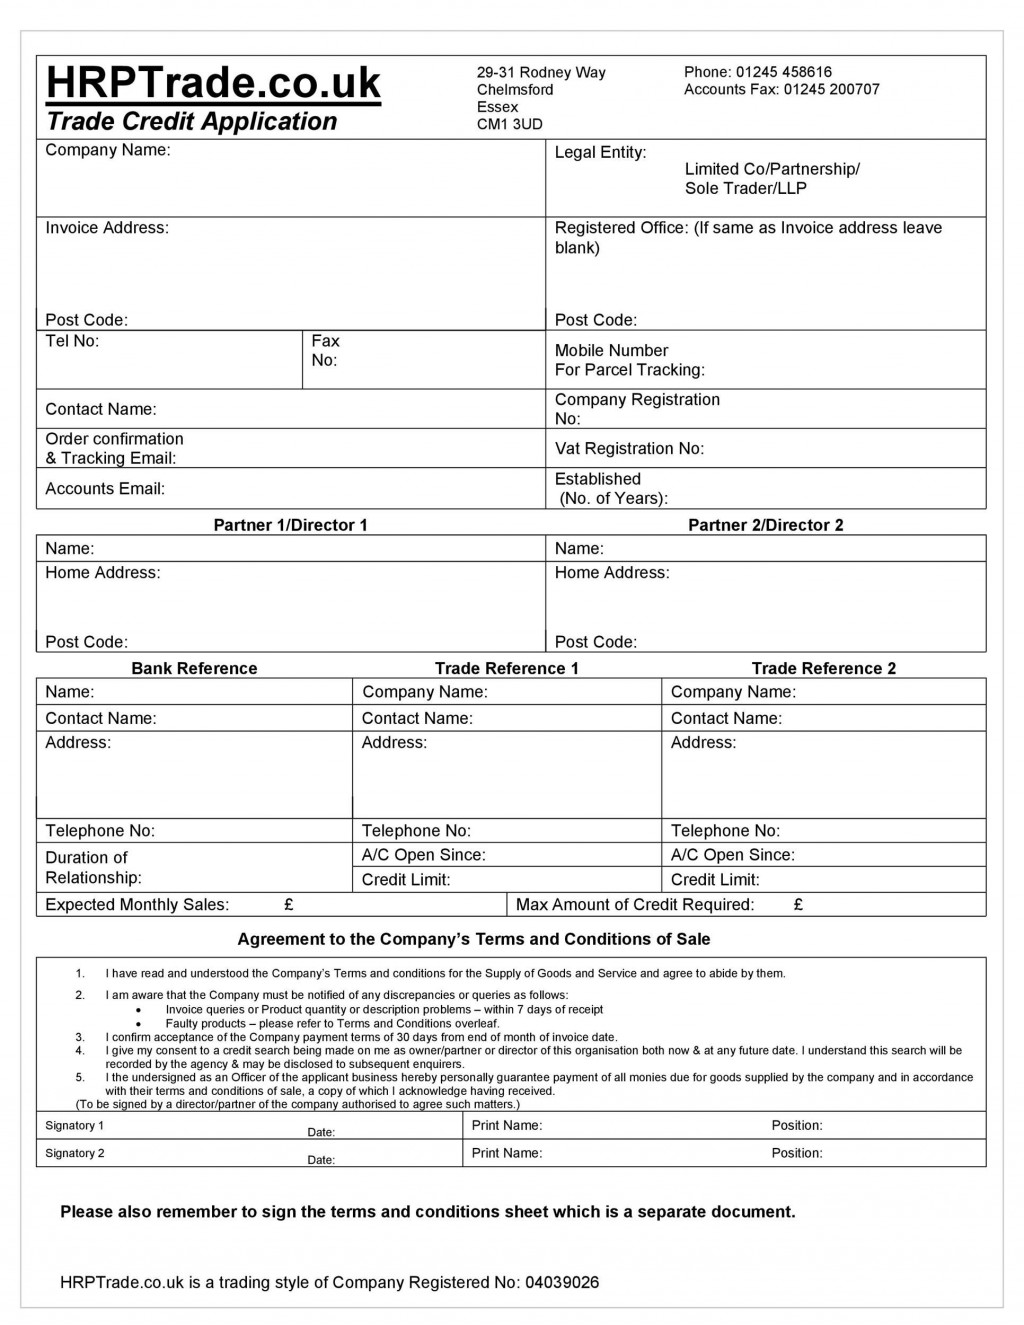 006 Breathtaking Busines Credit Application Form Template Design  Account Uk Australia CanadaLarge